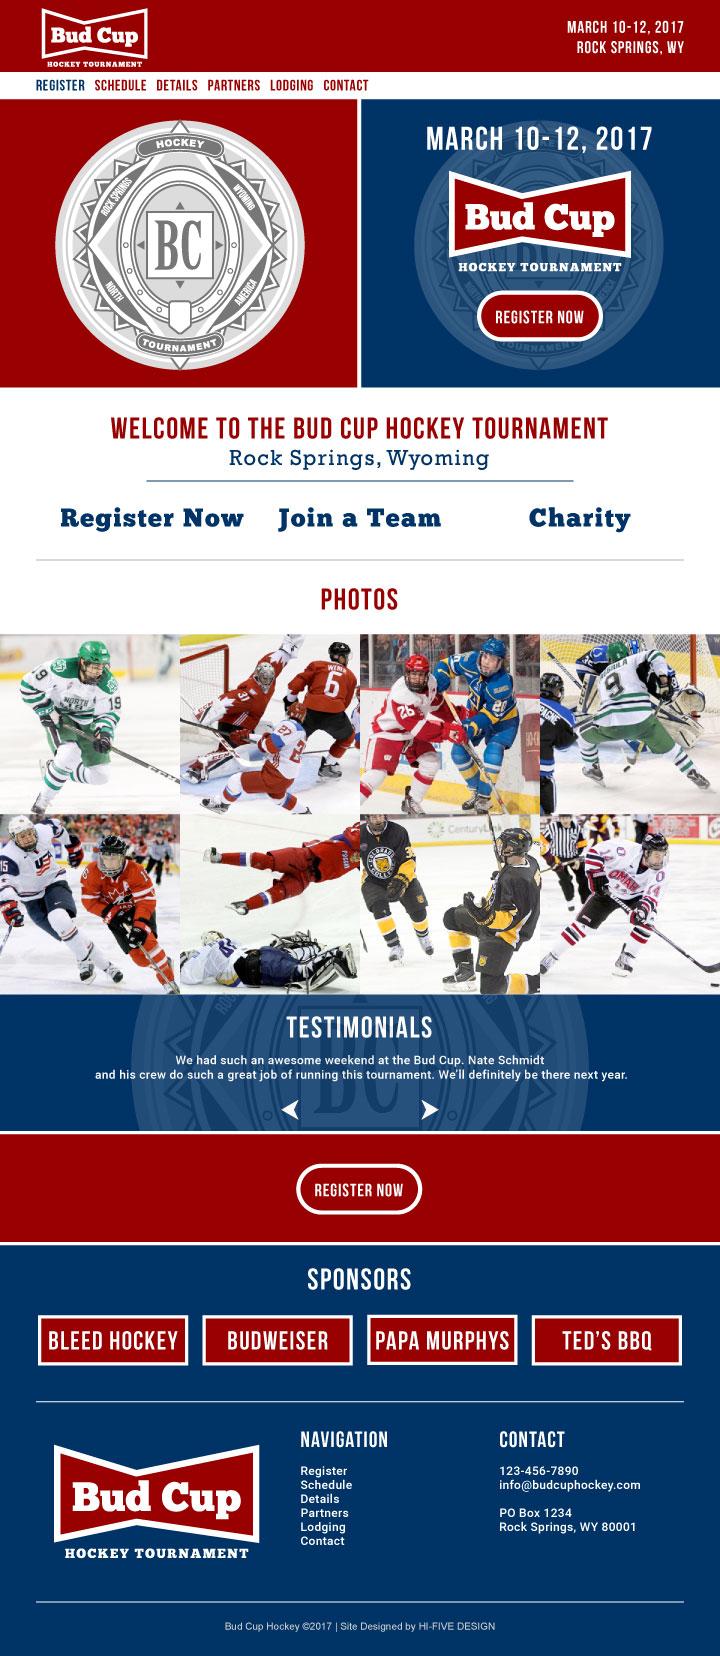 logo design colorado springs, graphic designer colorado springs, colorado logo, colorado design, hockey logo, hockey poster, hockey designer, hockey apparel design, hockey shirt design, hockey website design, hockey website, website designer, web designer colorado springs